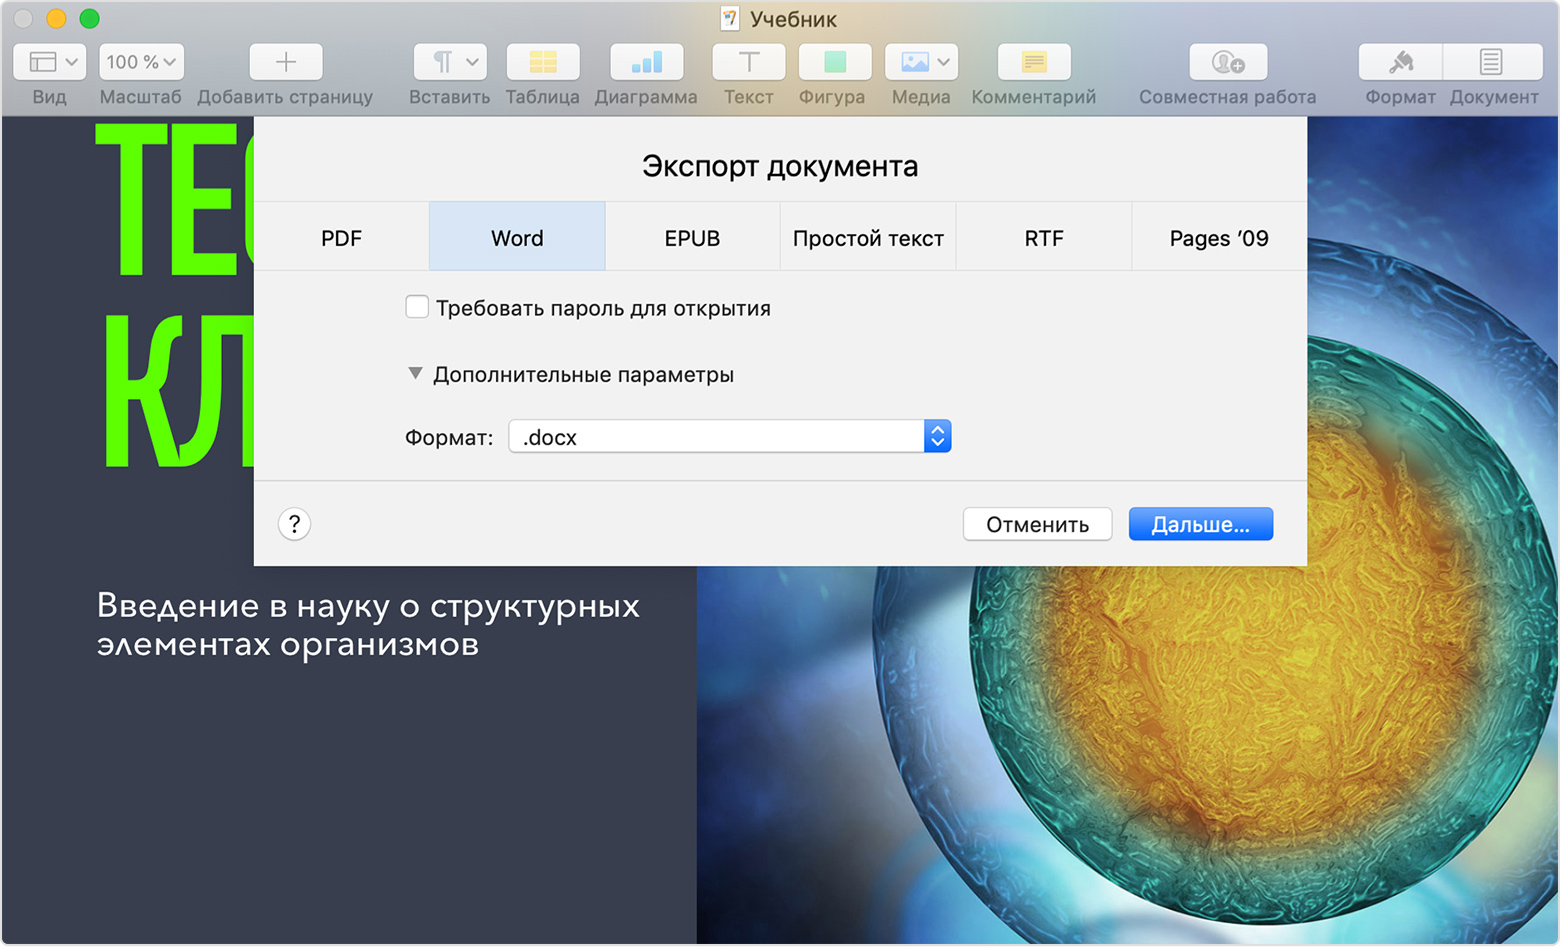 Конвертация документов Pages в формат PDF, Microsoft Word и другие